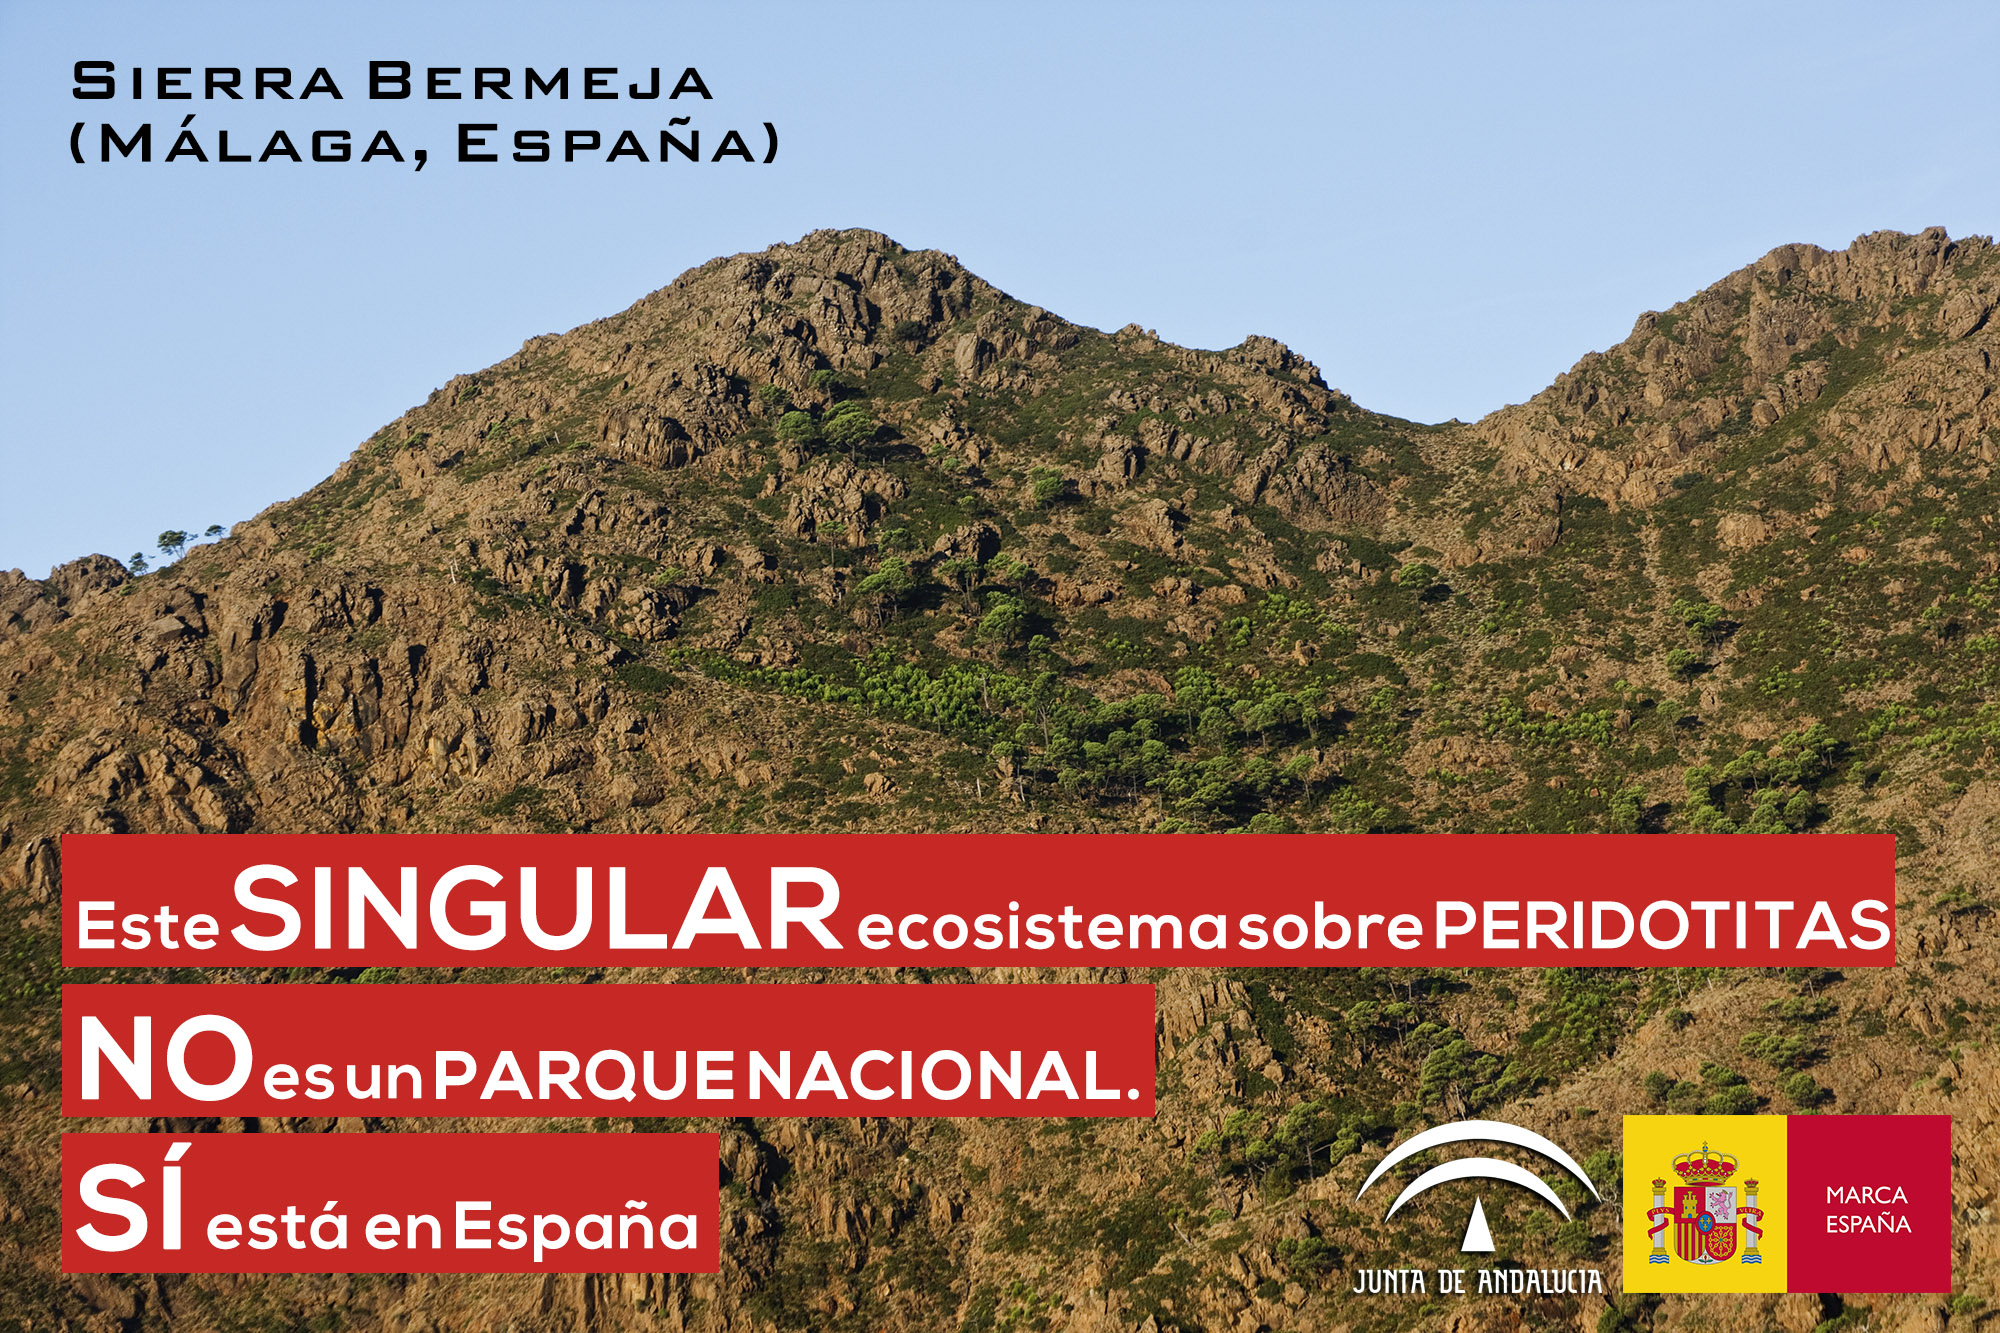 Ecosistemas serpentínicos: Sierra Bermeja